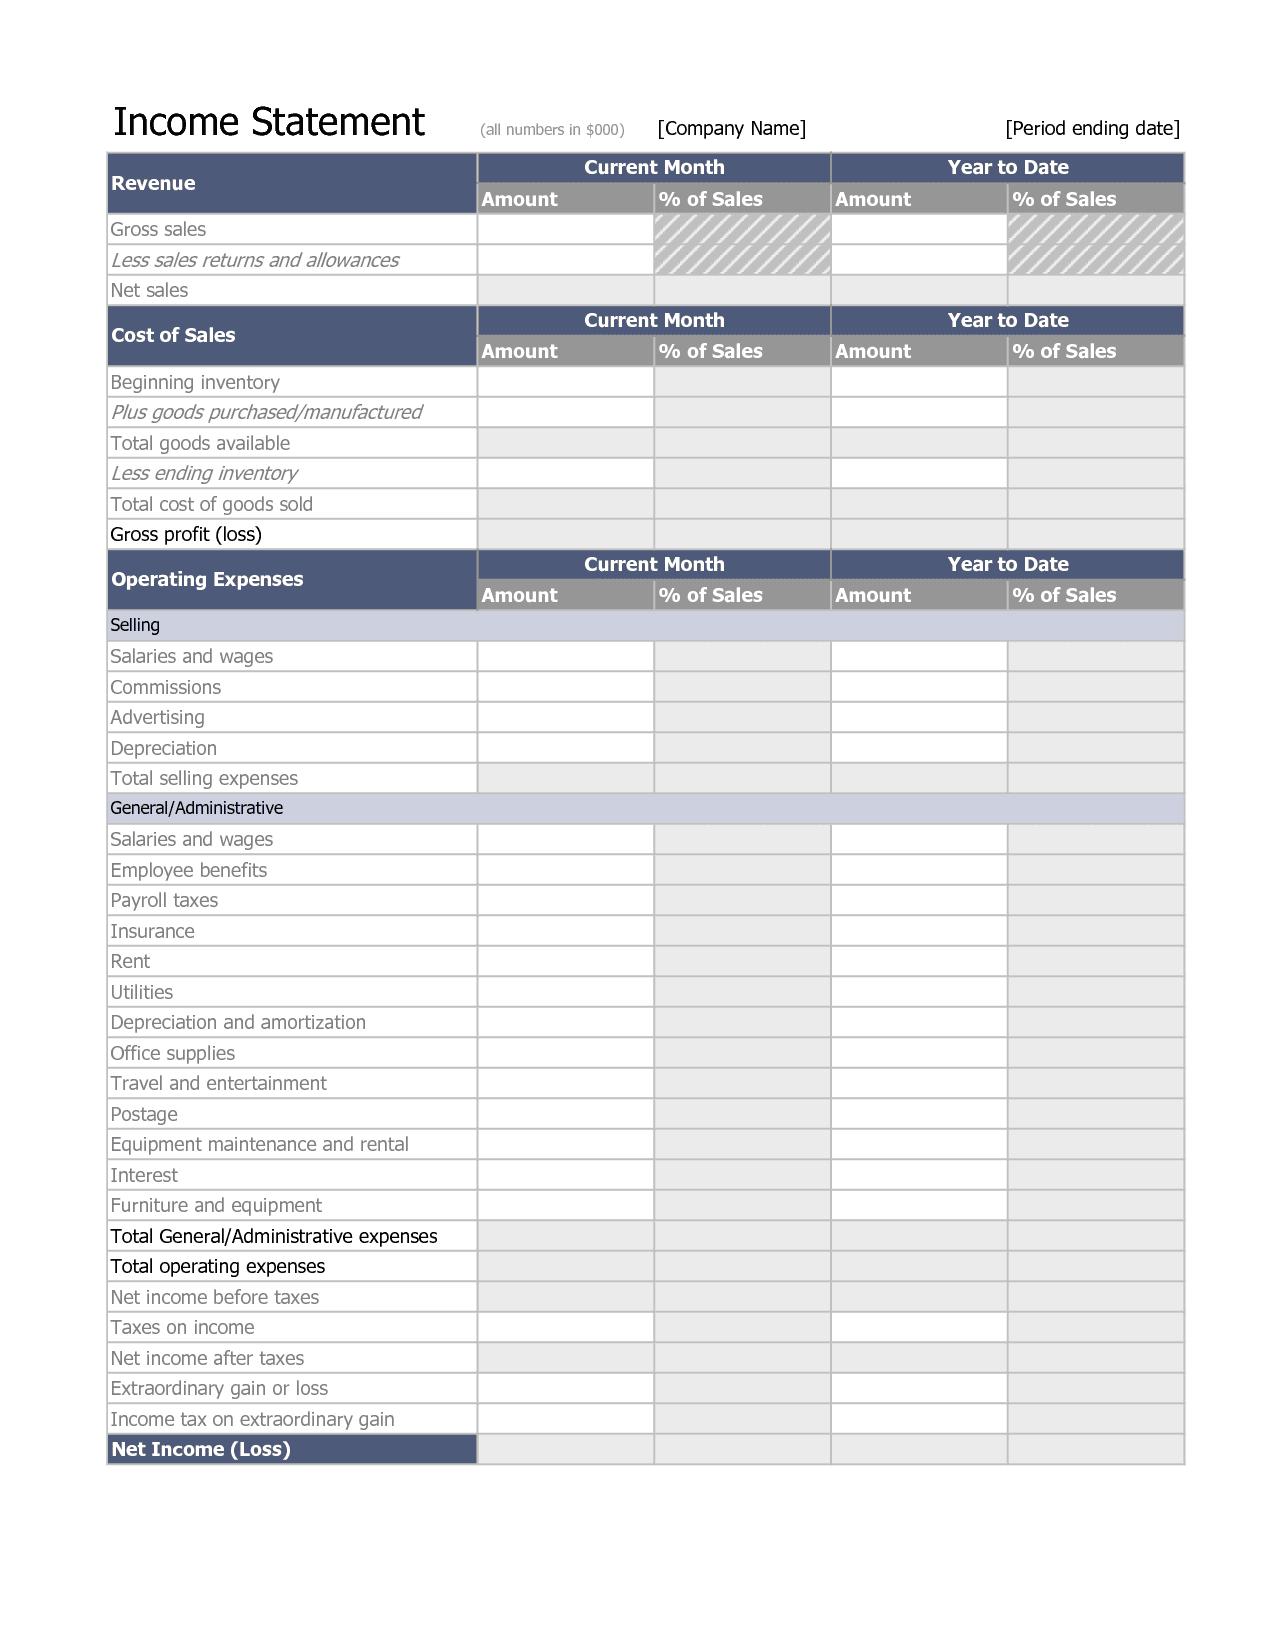 Income Statement Worksheet Excel